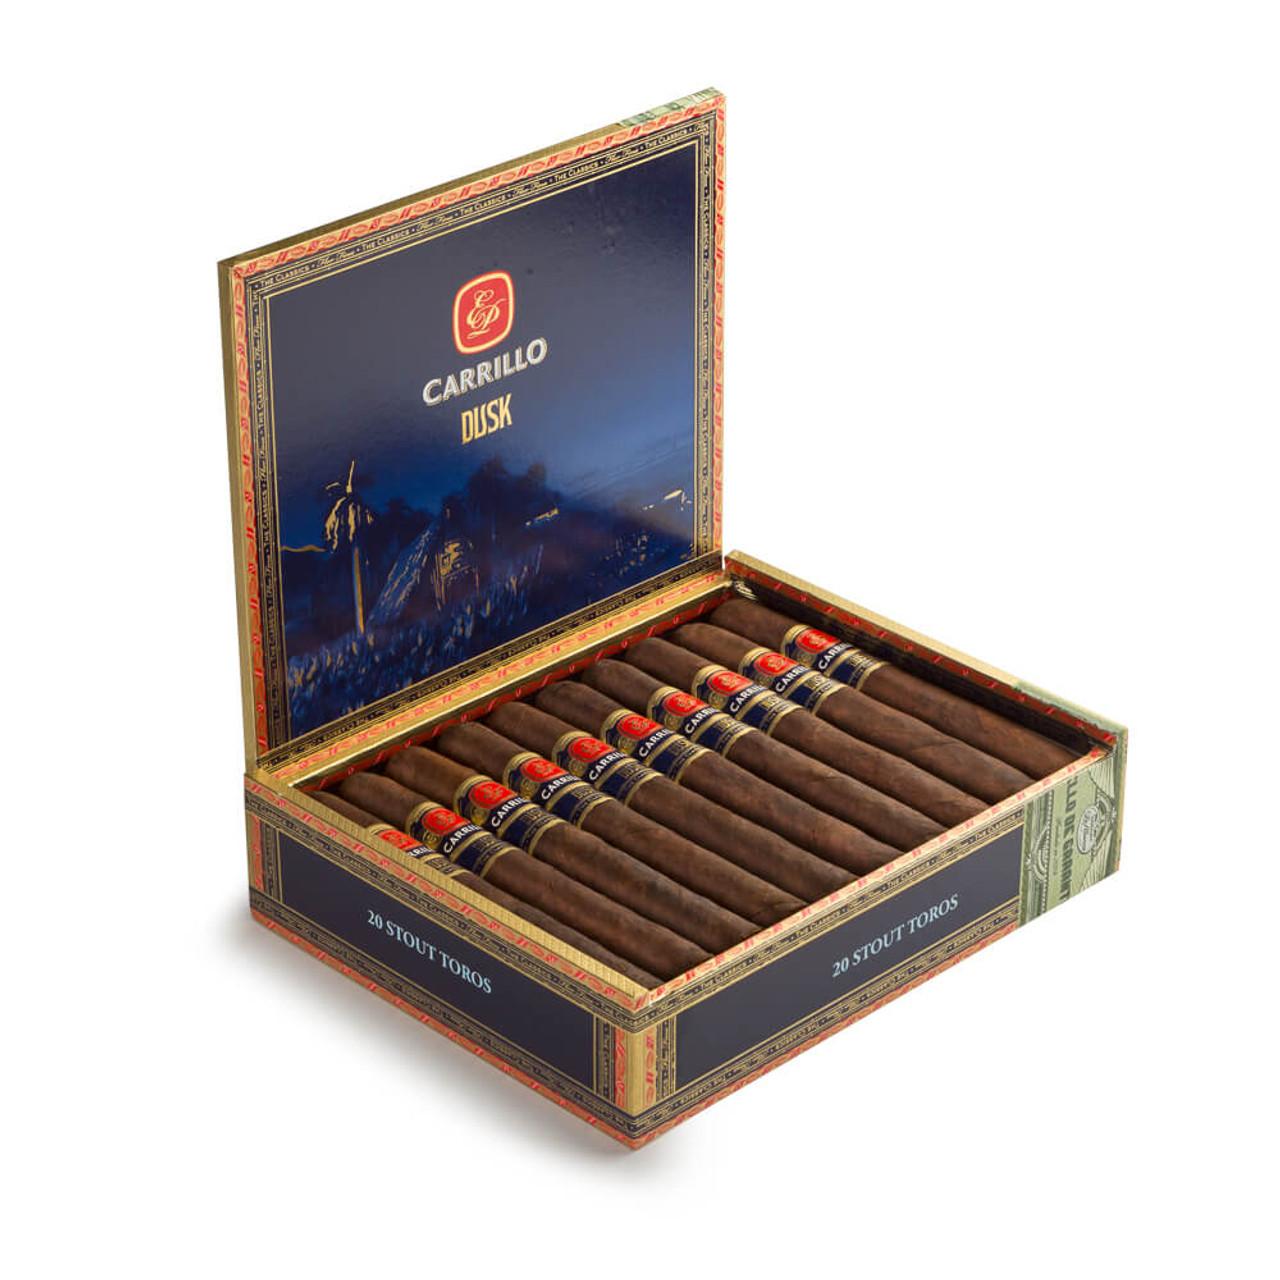 E.P. Carrillo Dusk Solidos Cigars - 6 x 60 (Box of 20)